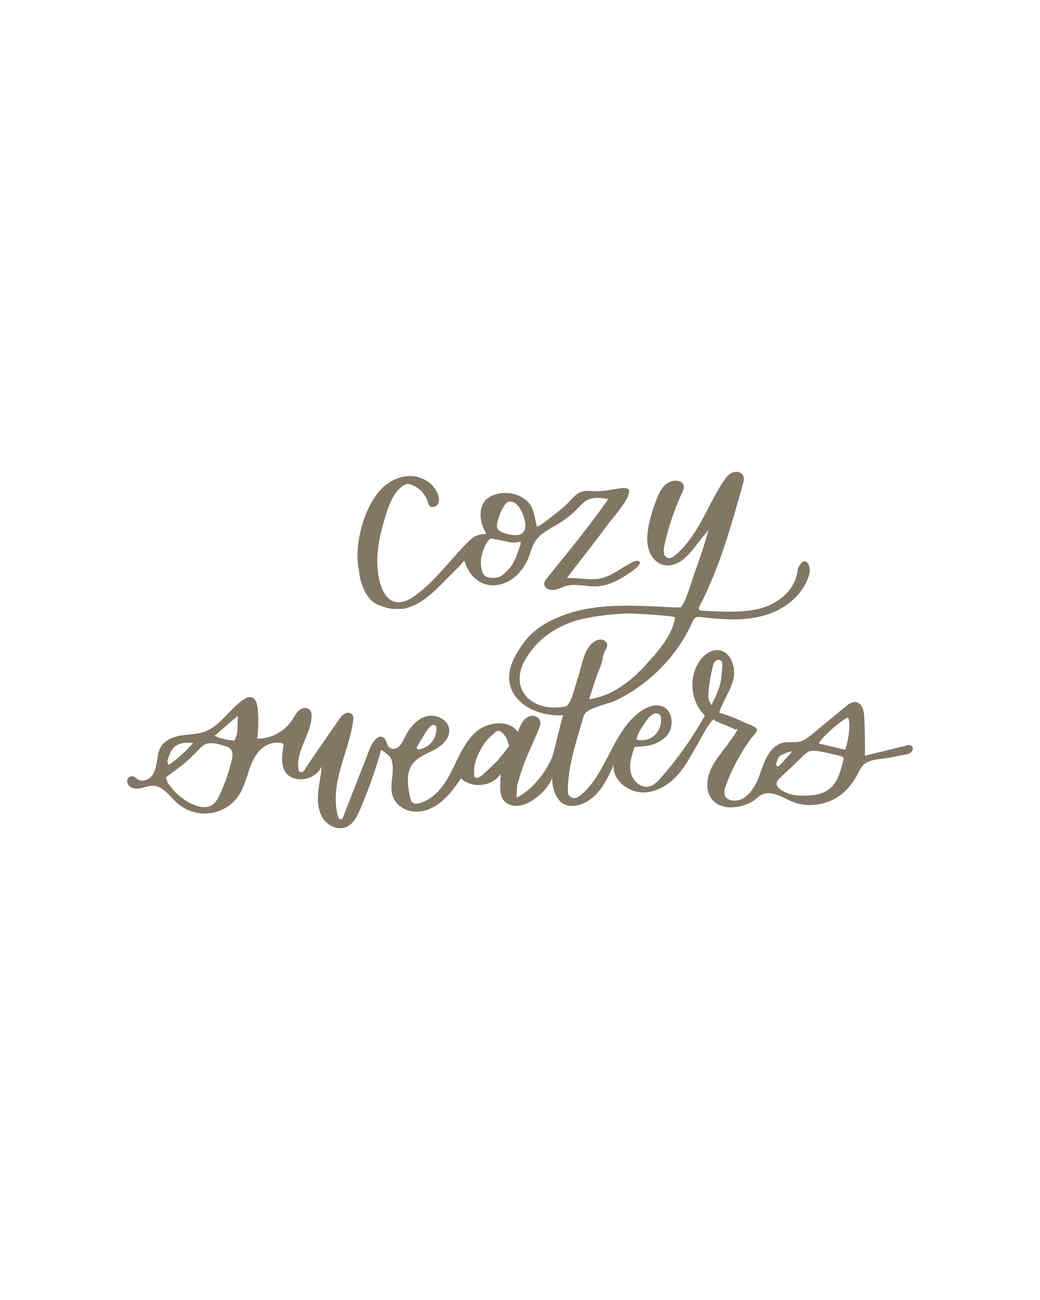 """cozy sweaters"" calligraphy"